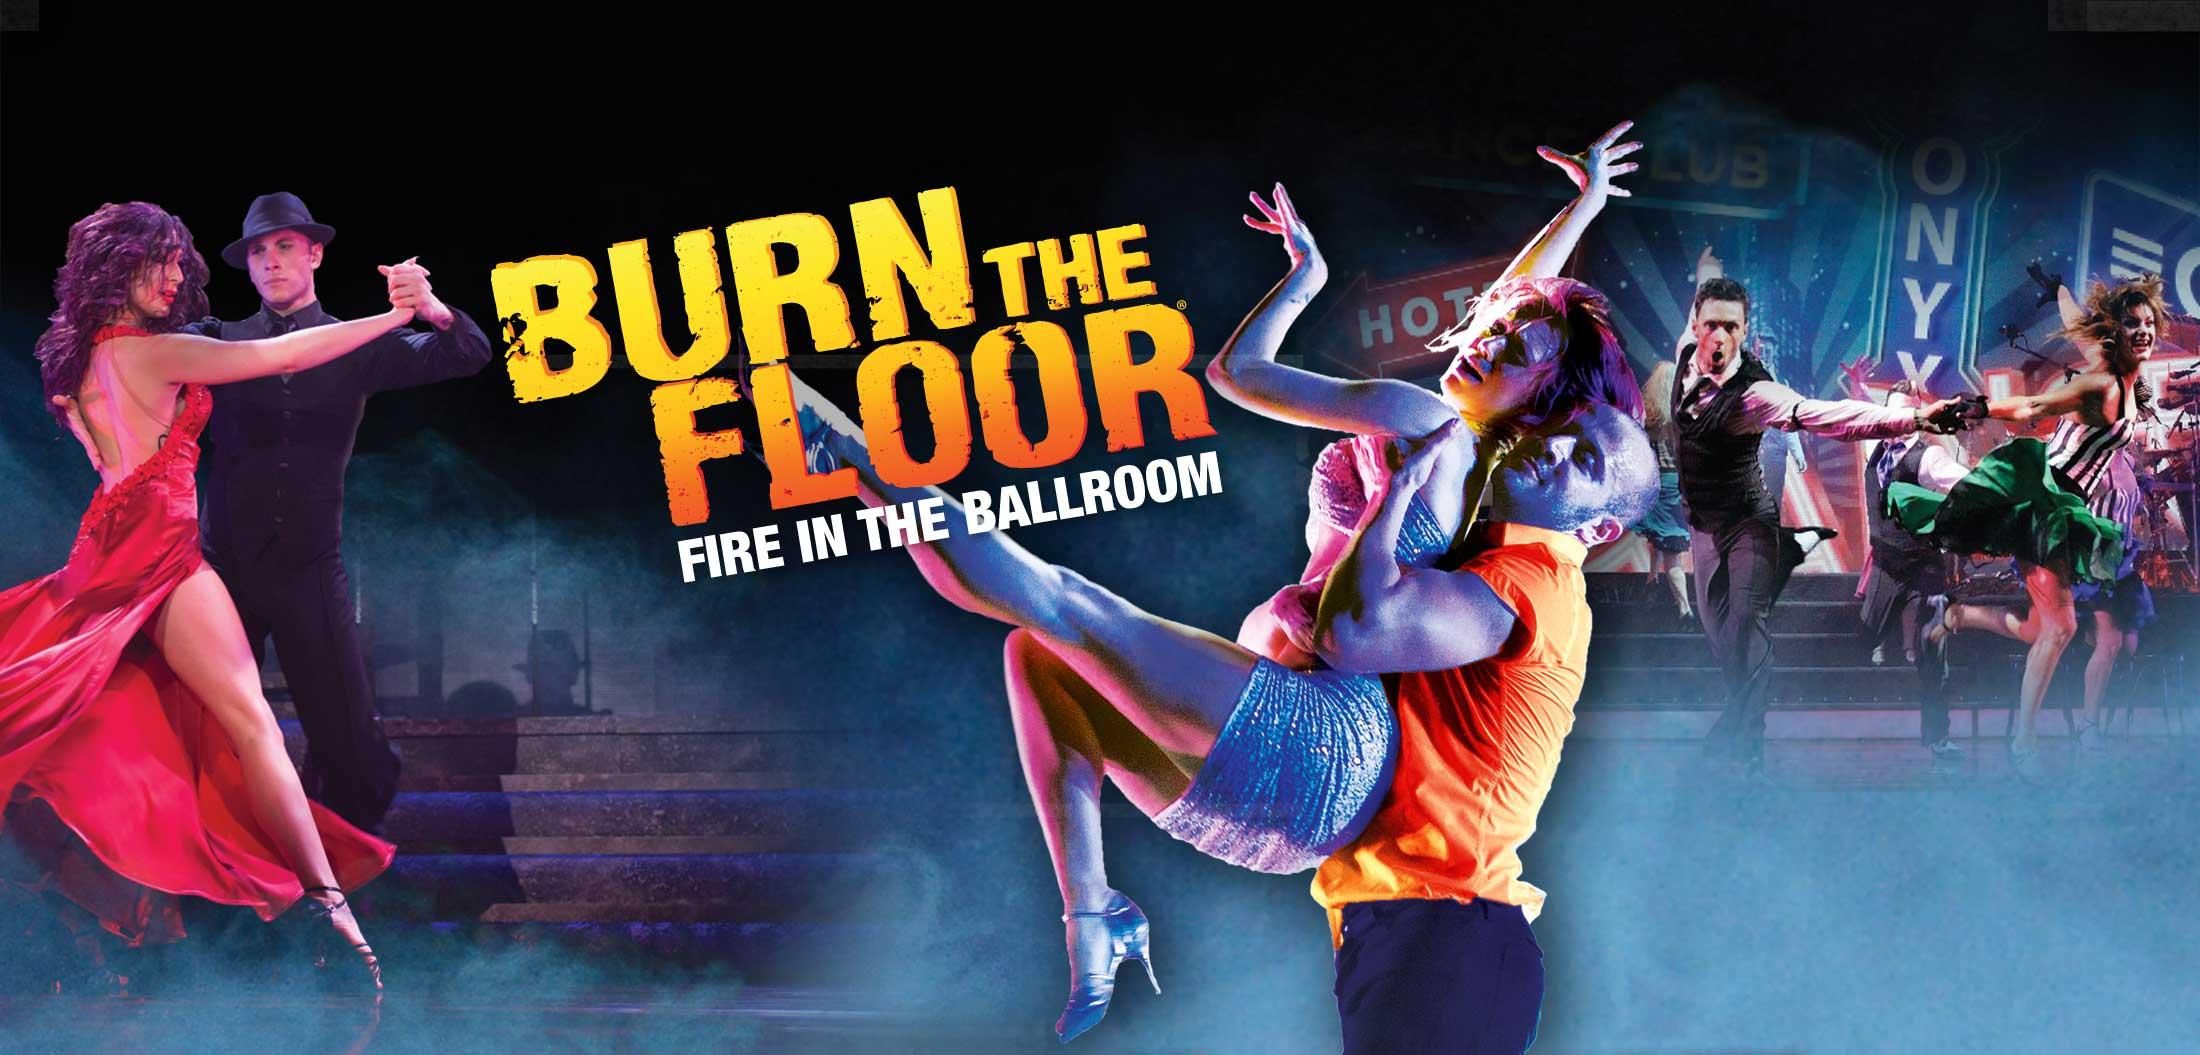 BURN THE FLOOR    LONGACRE THEATRE, BROADWAY   July 25th, 2009 through January 10th, 2010  DIRECTOR: JASON GILKISON   Burn Online